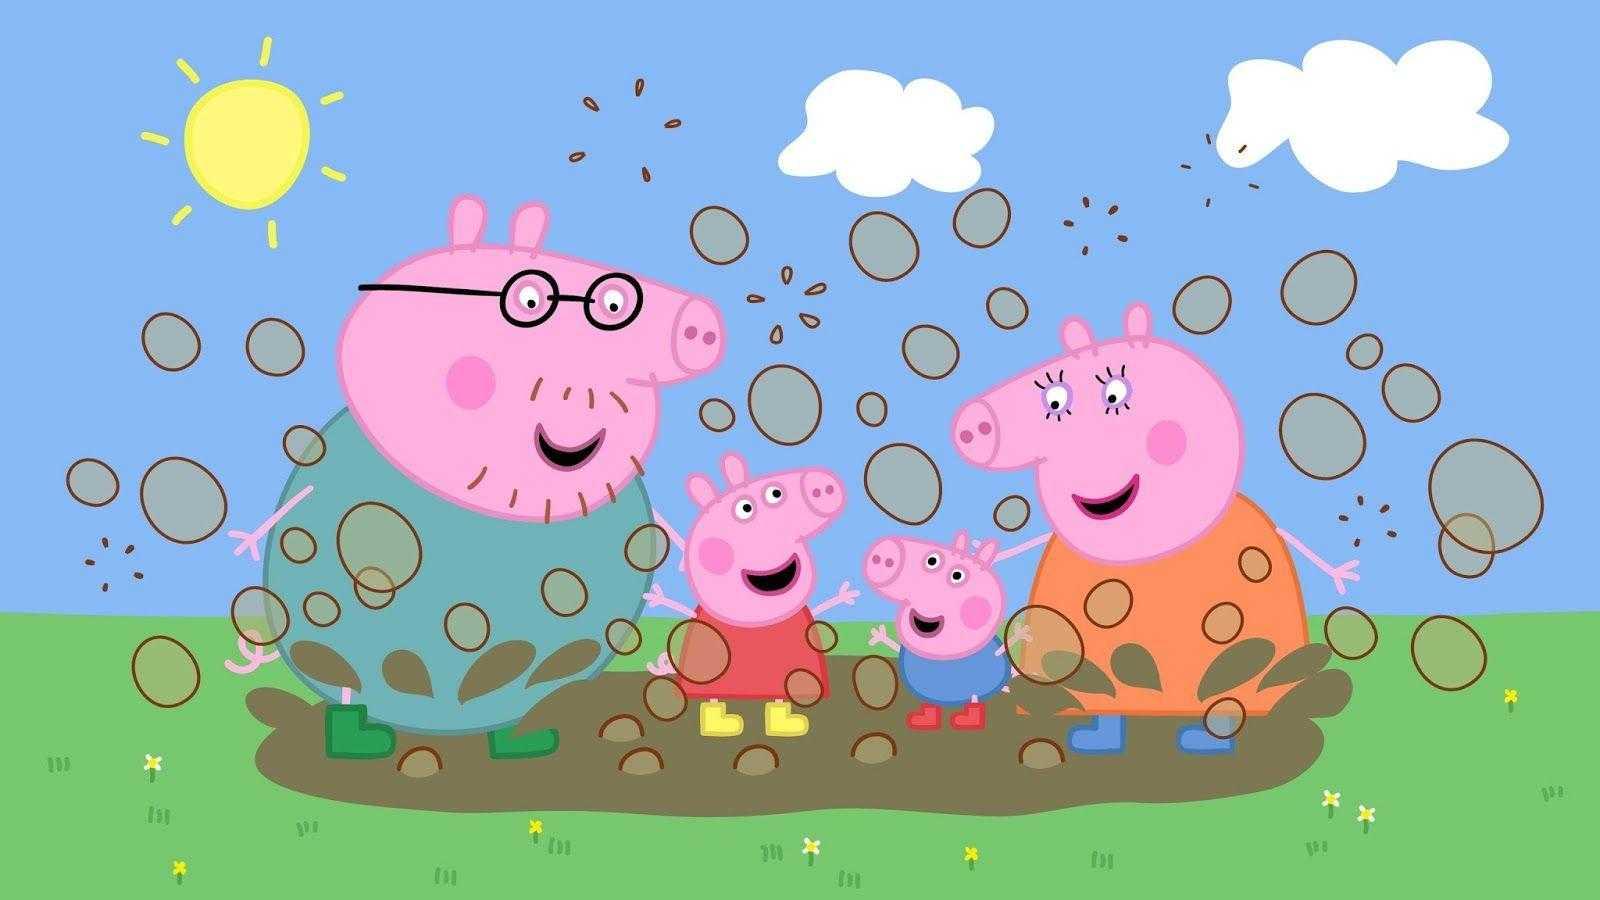 Peppa Pig House Fond D'écran - EnJpg